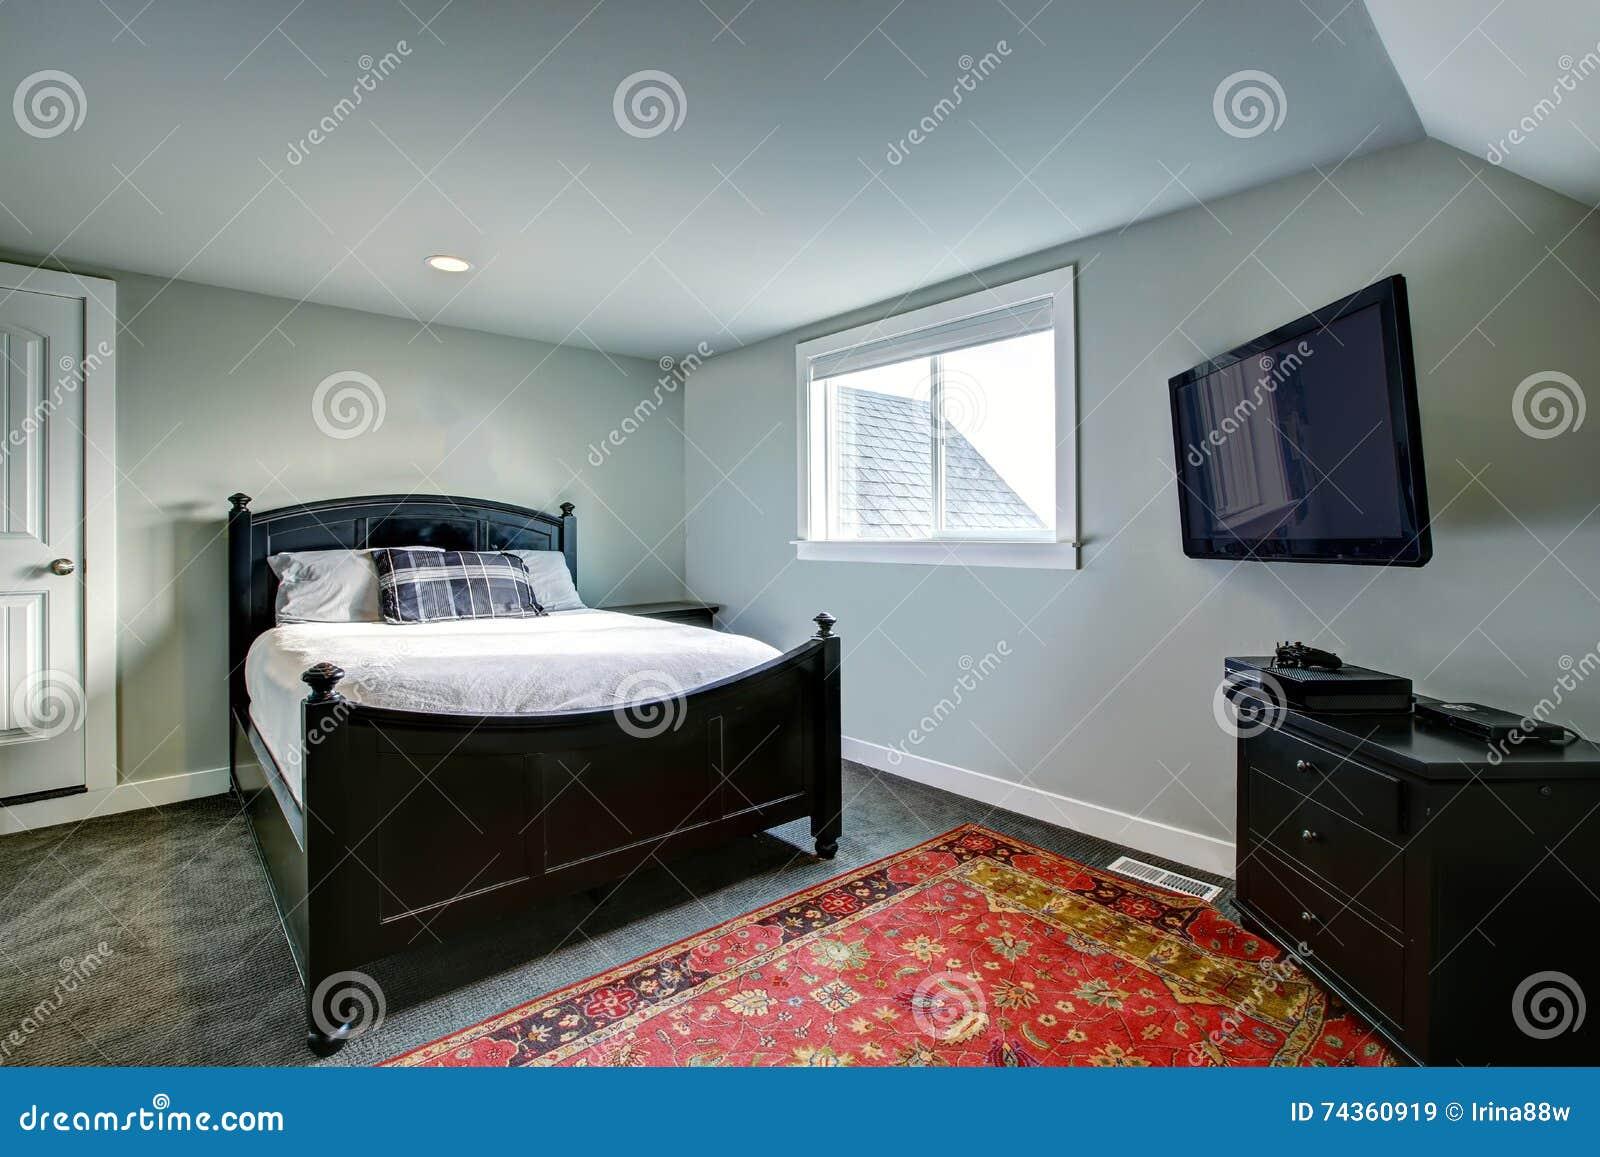 https://thumbs.dreamstime.com/z/klassieke-amerikaanse-slaapkamer-met-groene-muren-en-zwart-meubilair-74360919.jpg